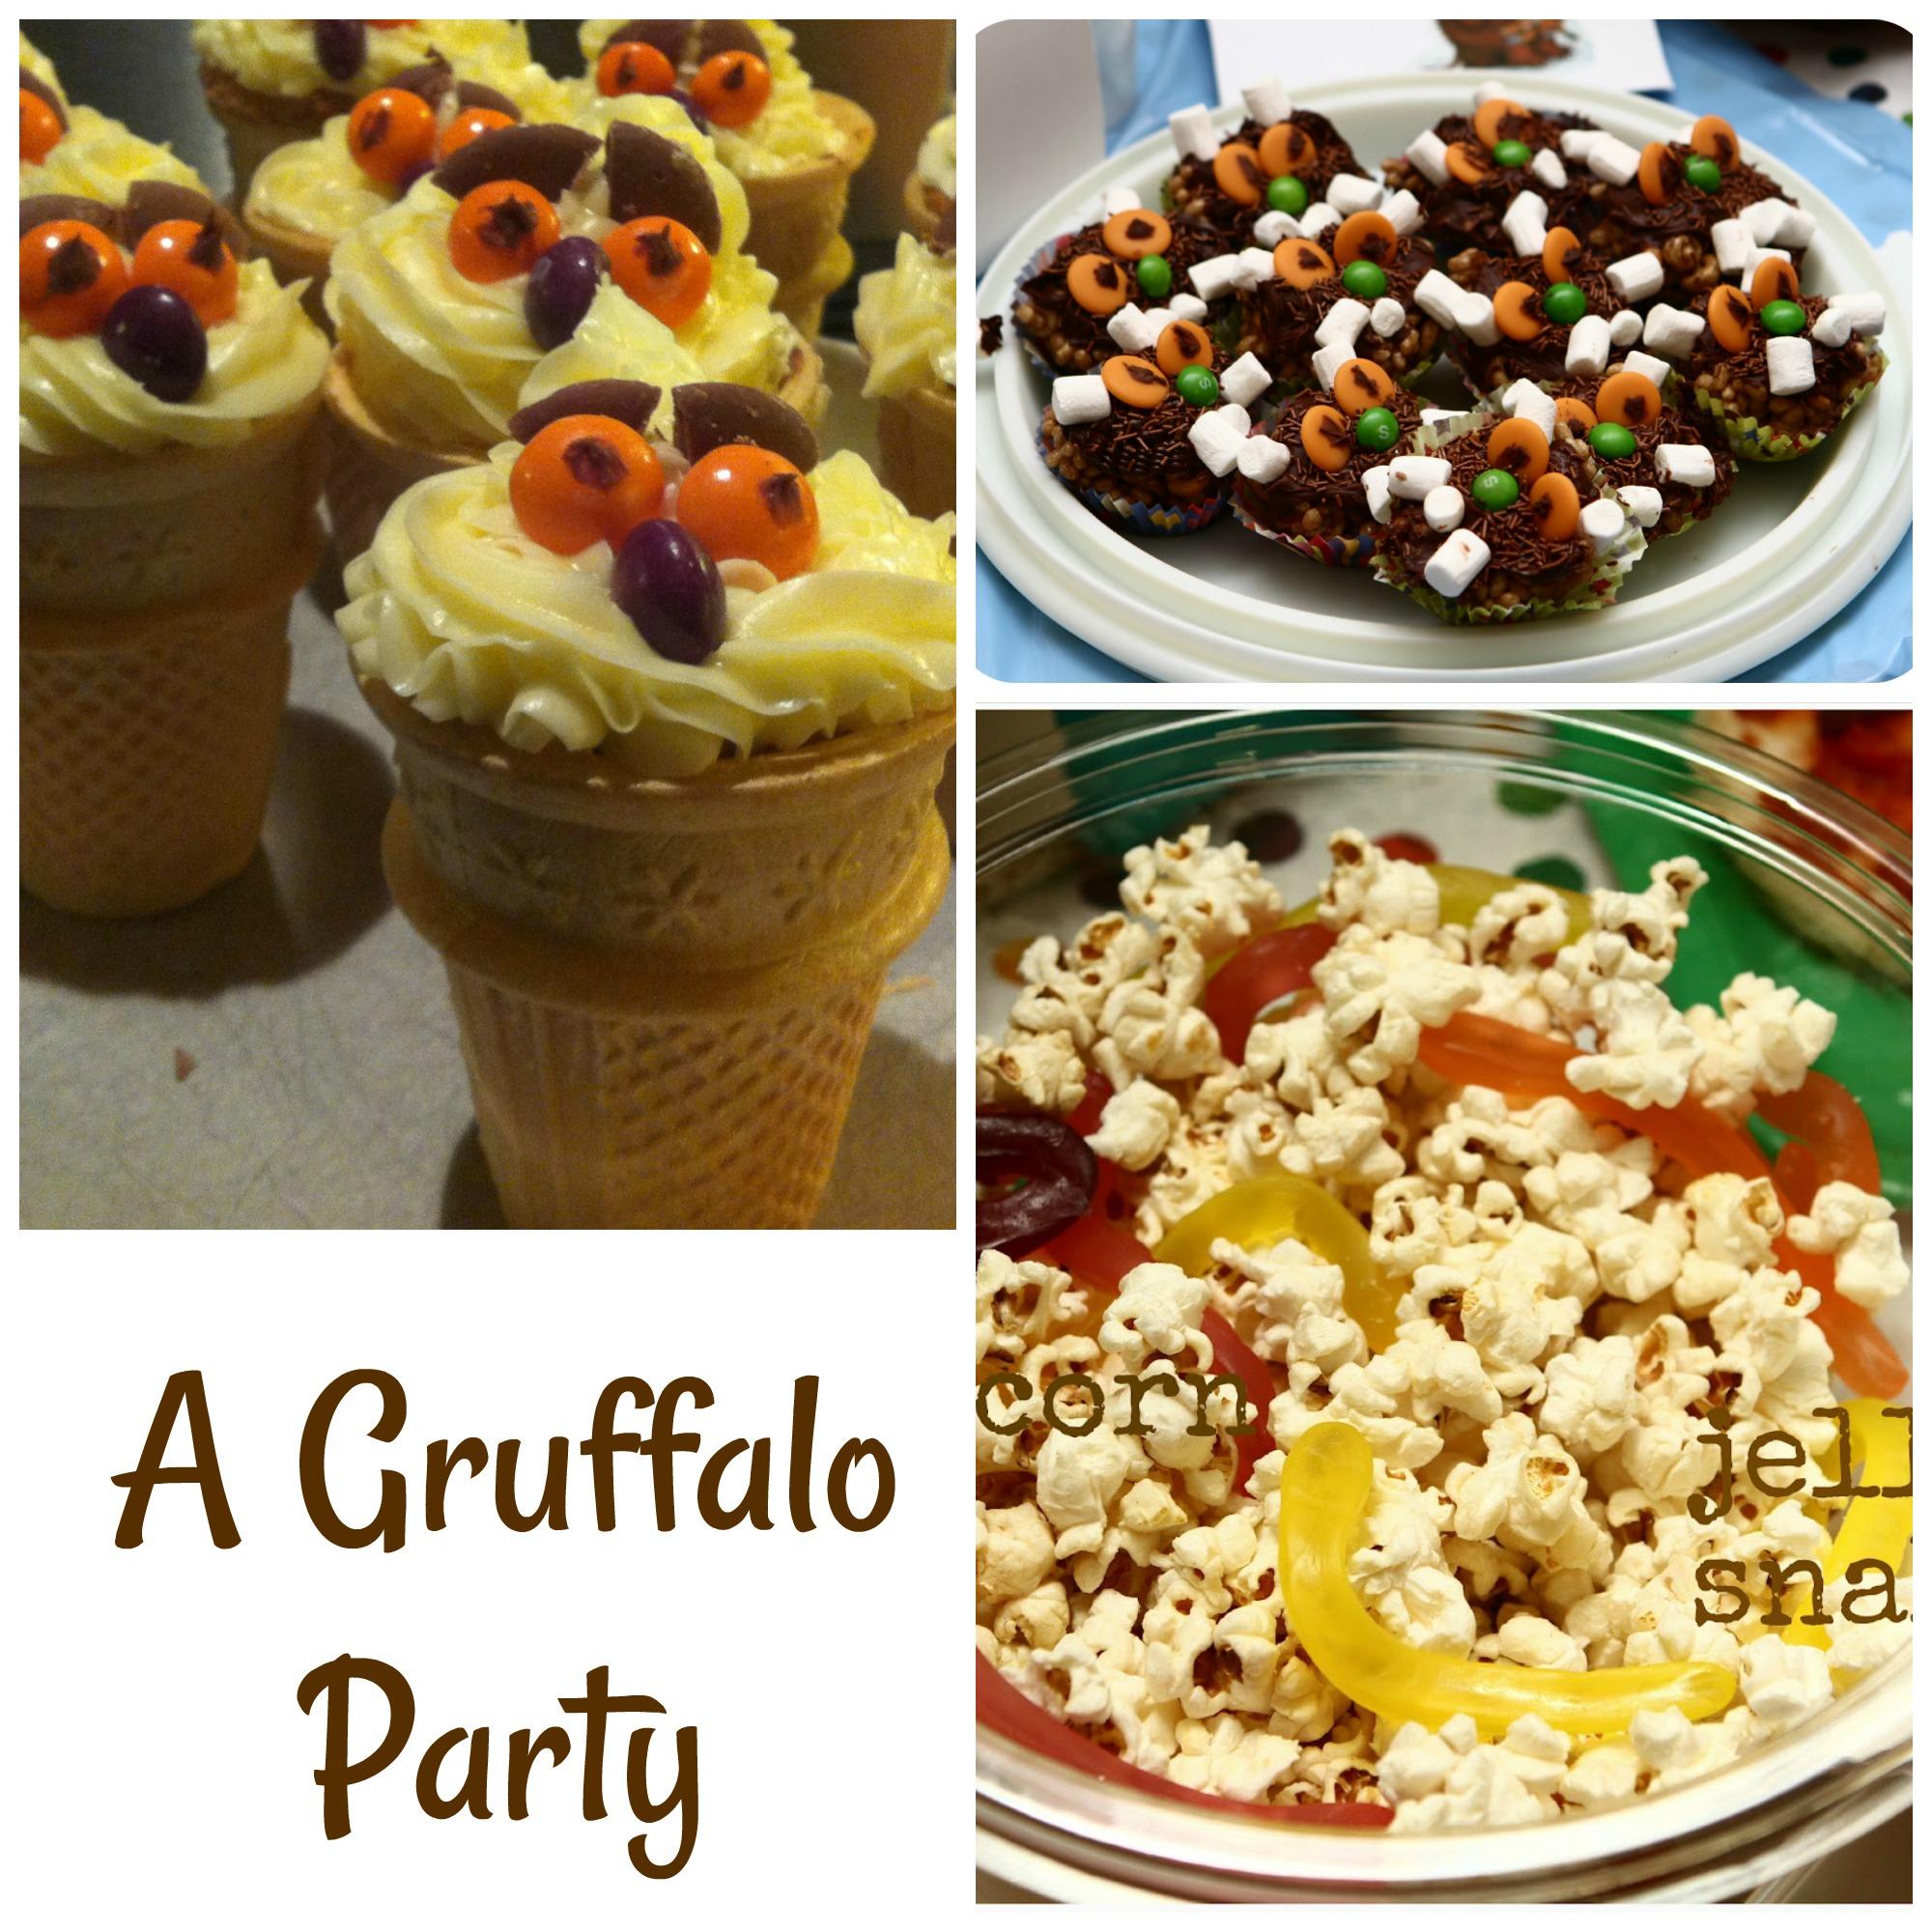 Gruffalo Party Food Ideas